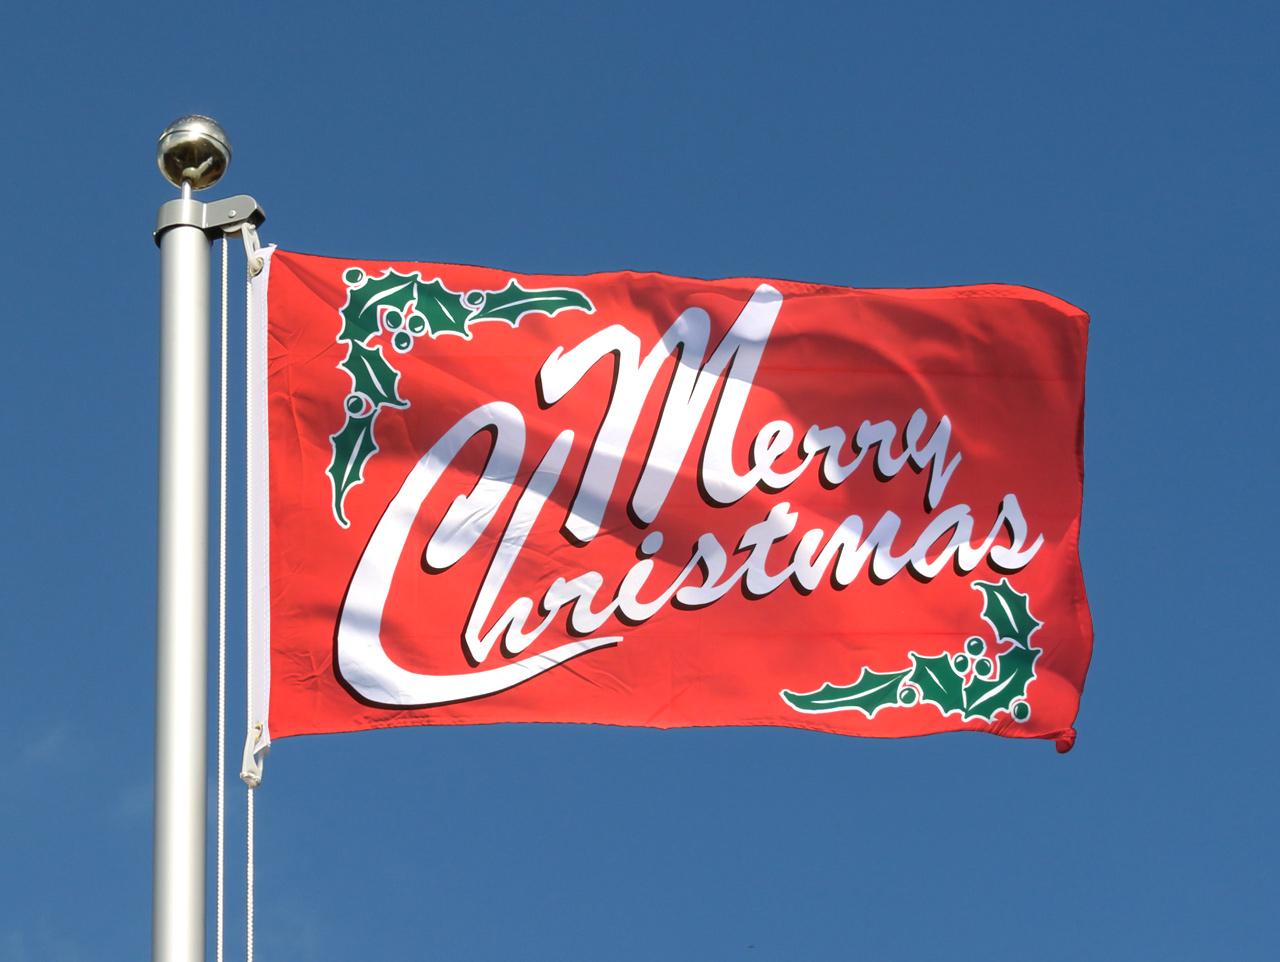 Cheap Flag Merry Christmas - 2x3 ft - Royal-Flags